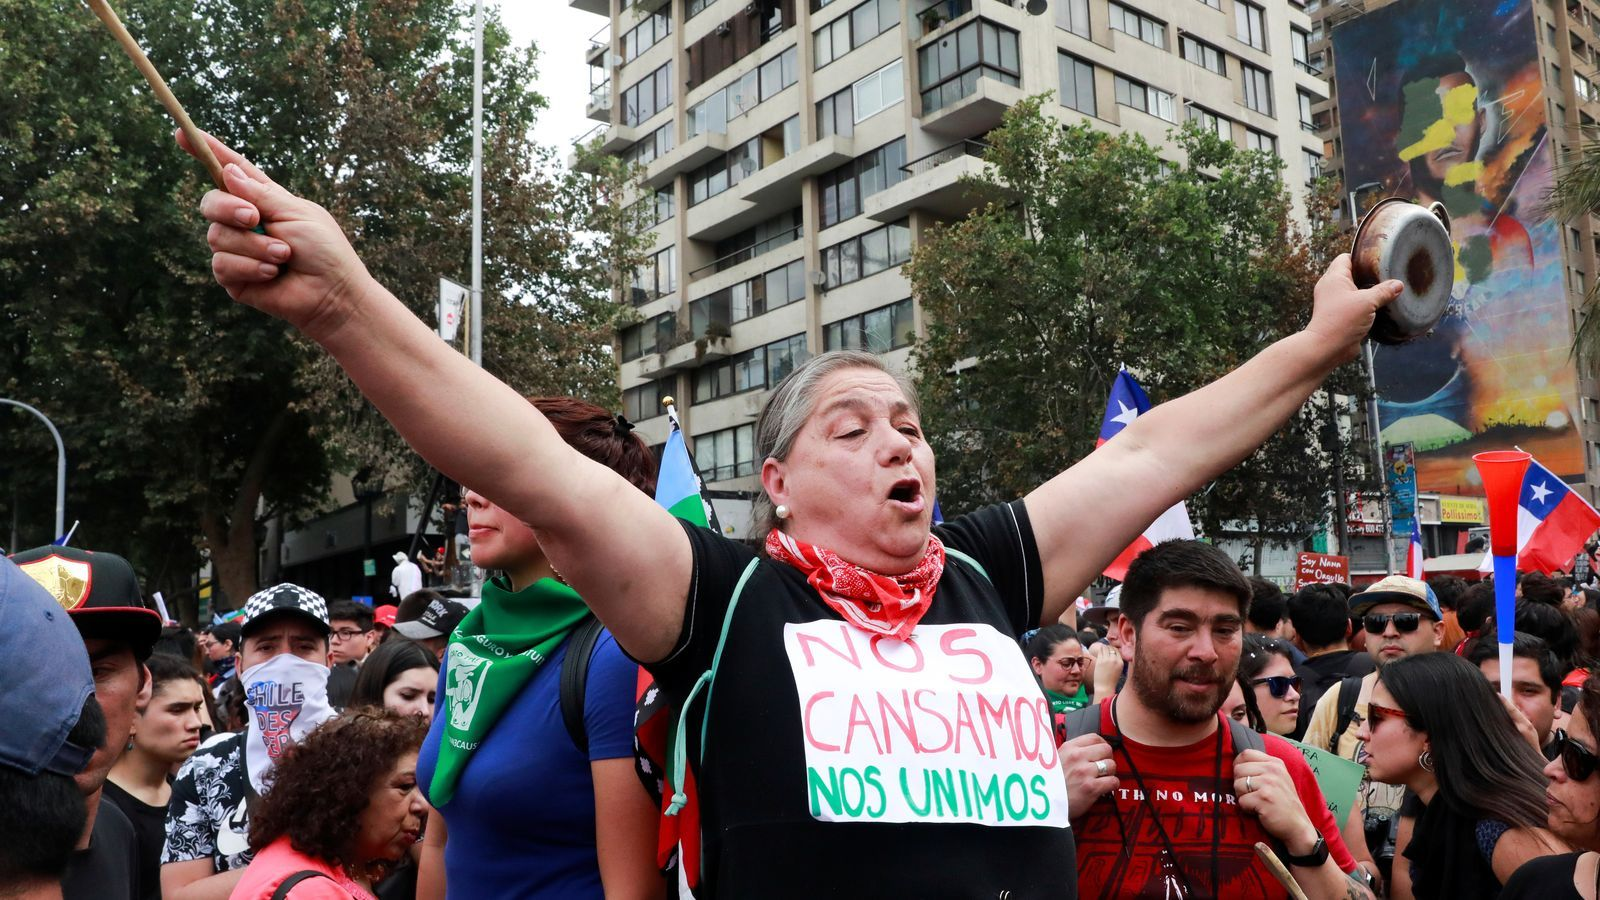 Una dona protesta en una de les concentracions convocades a Xile